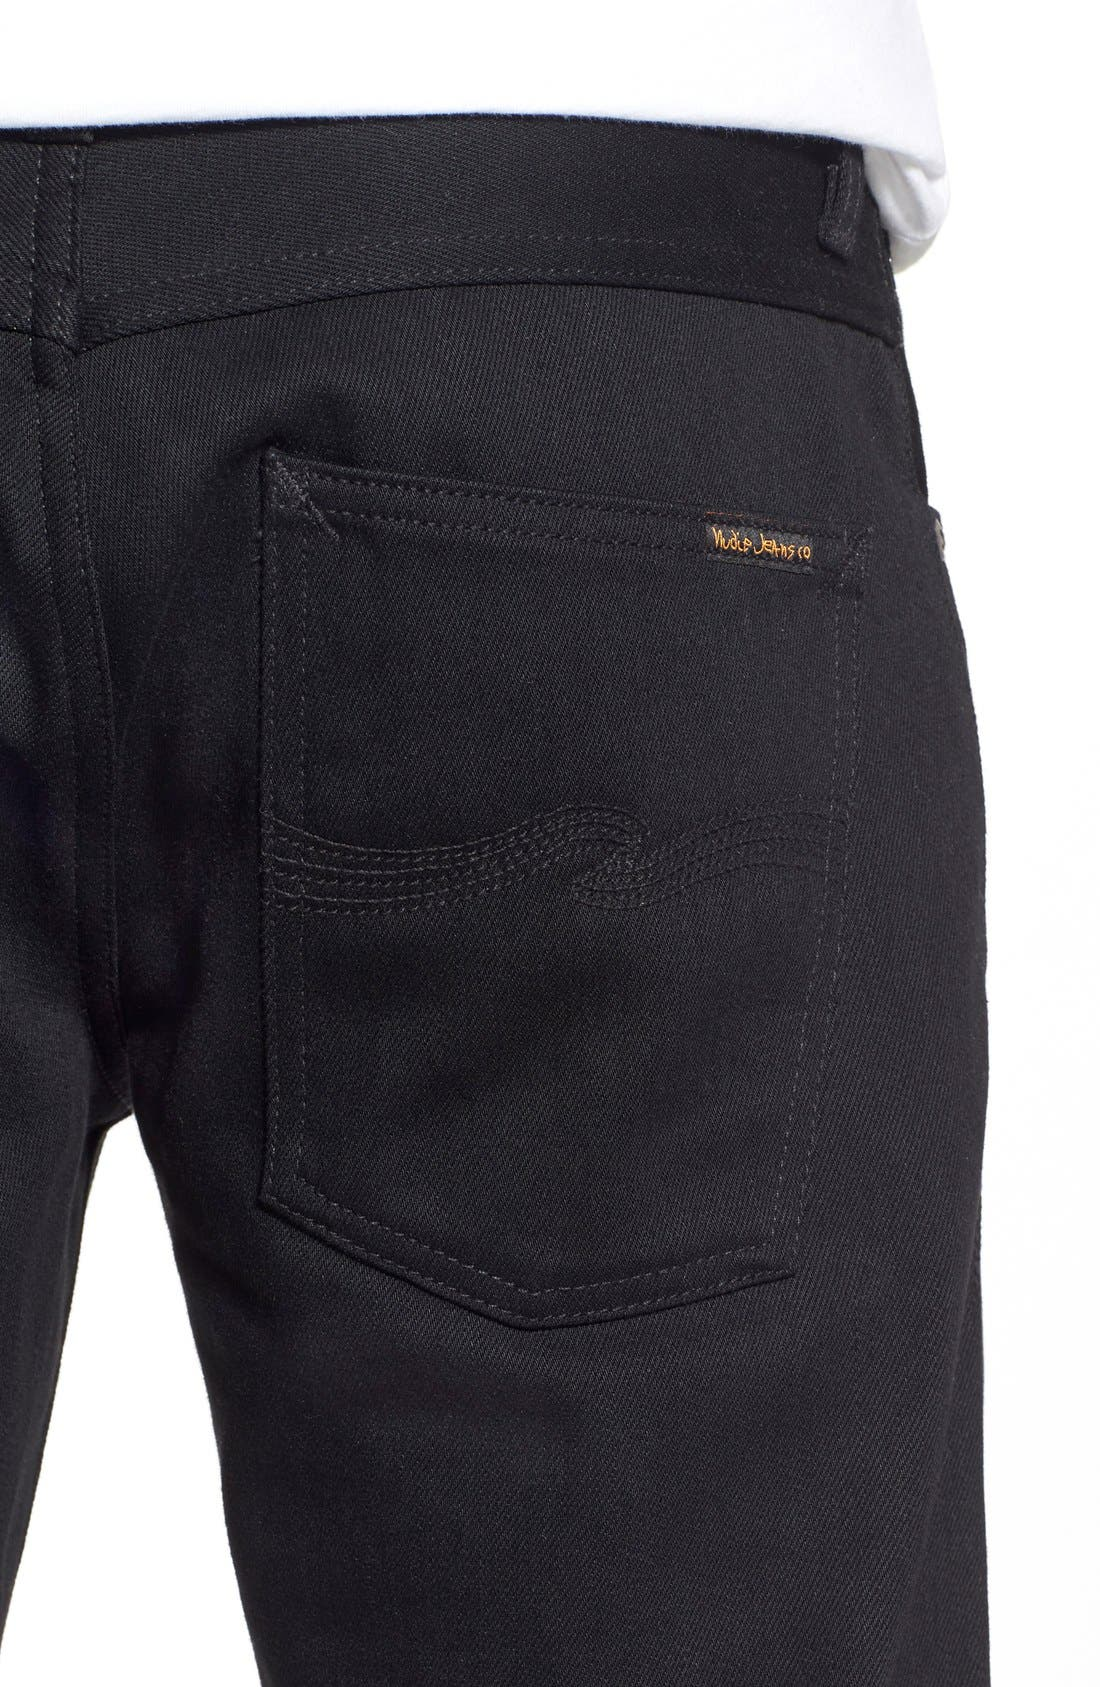 NUDIE JEANS,                             'Grim Tim' Slim Fit Raw Selvedge Jeans,                             Alternate thumbnail 2, color,                             001